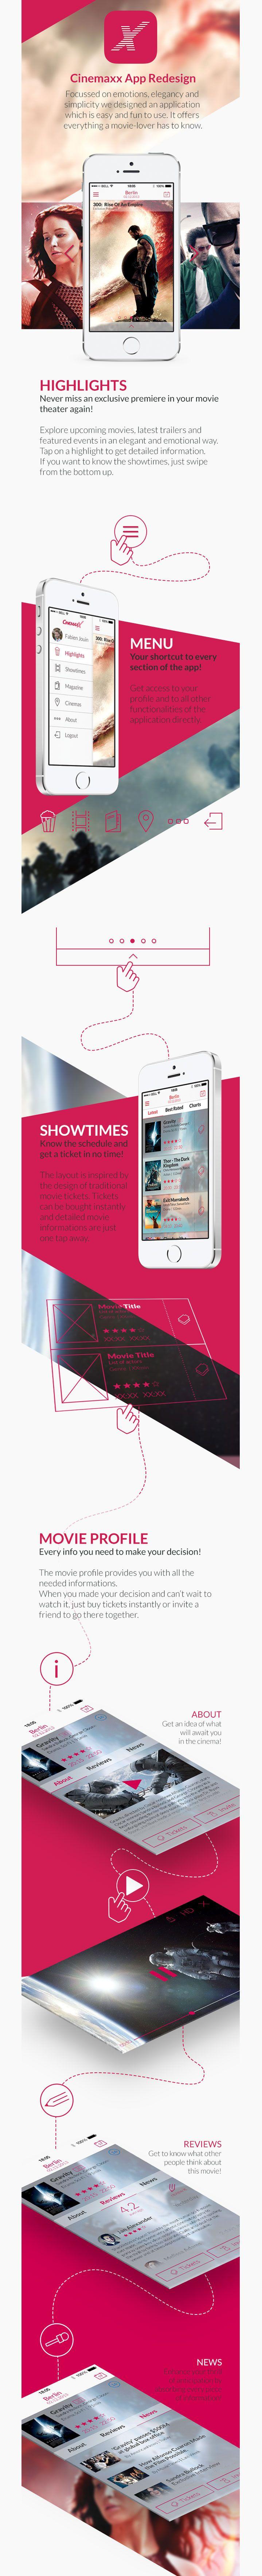 Cinemaxx Movie Theater – App Redesign